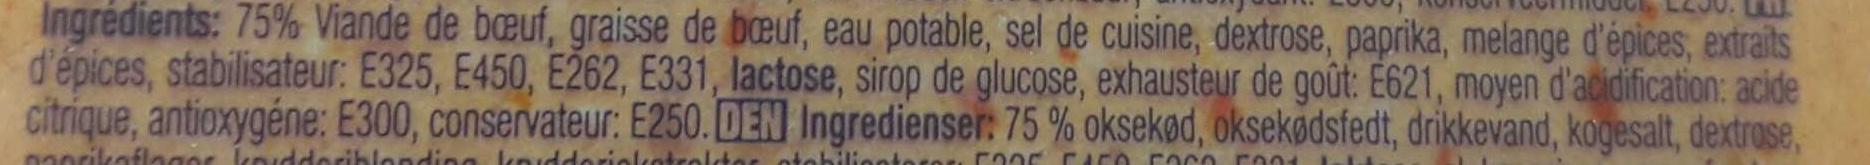 Biberli sigir salam dilimli - Ingredients - fr